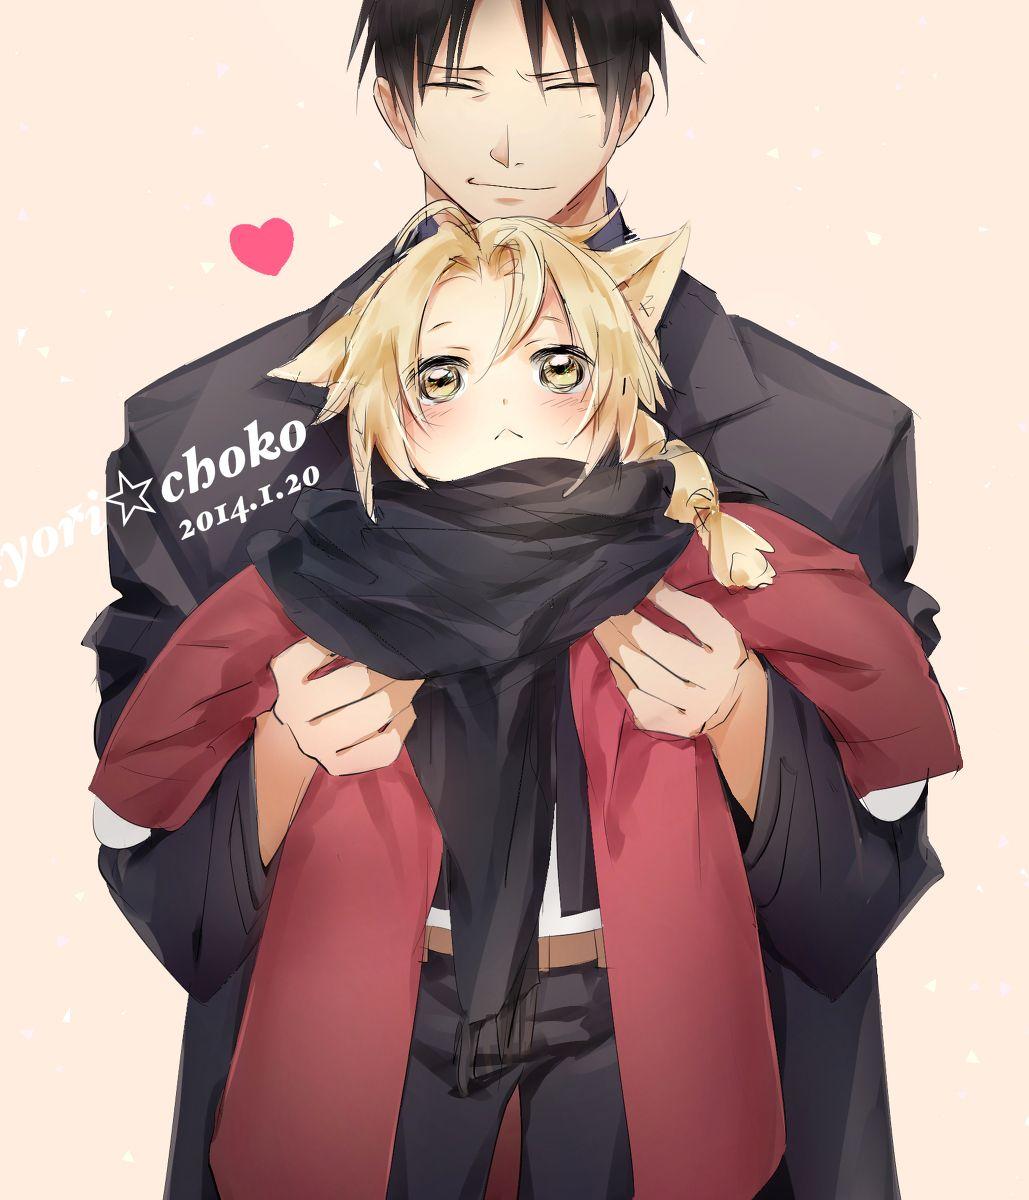 Fullmetal Alchemist Roy Holding Adorable Chibi Neko Ed! SO